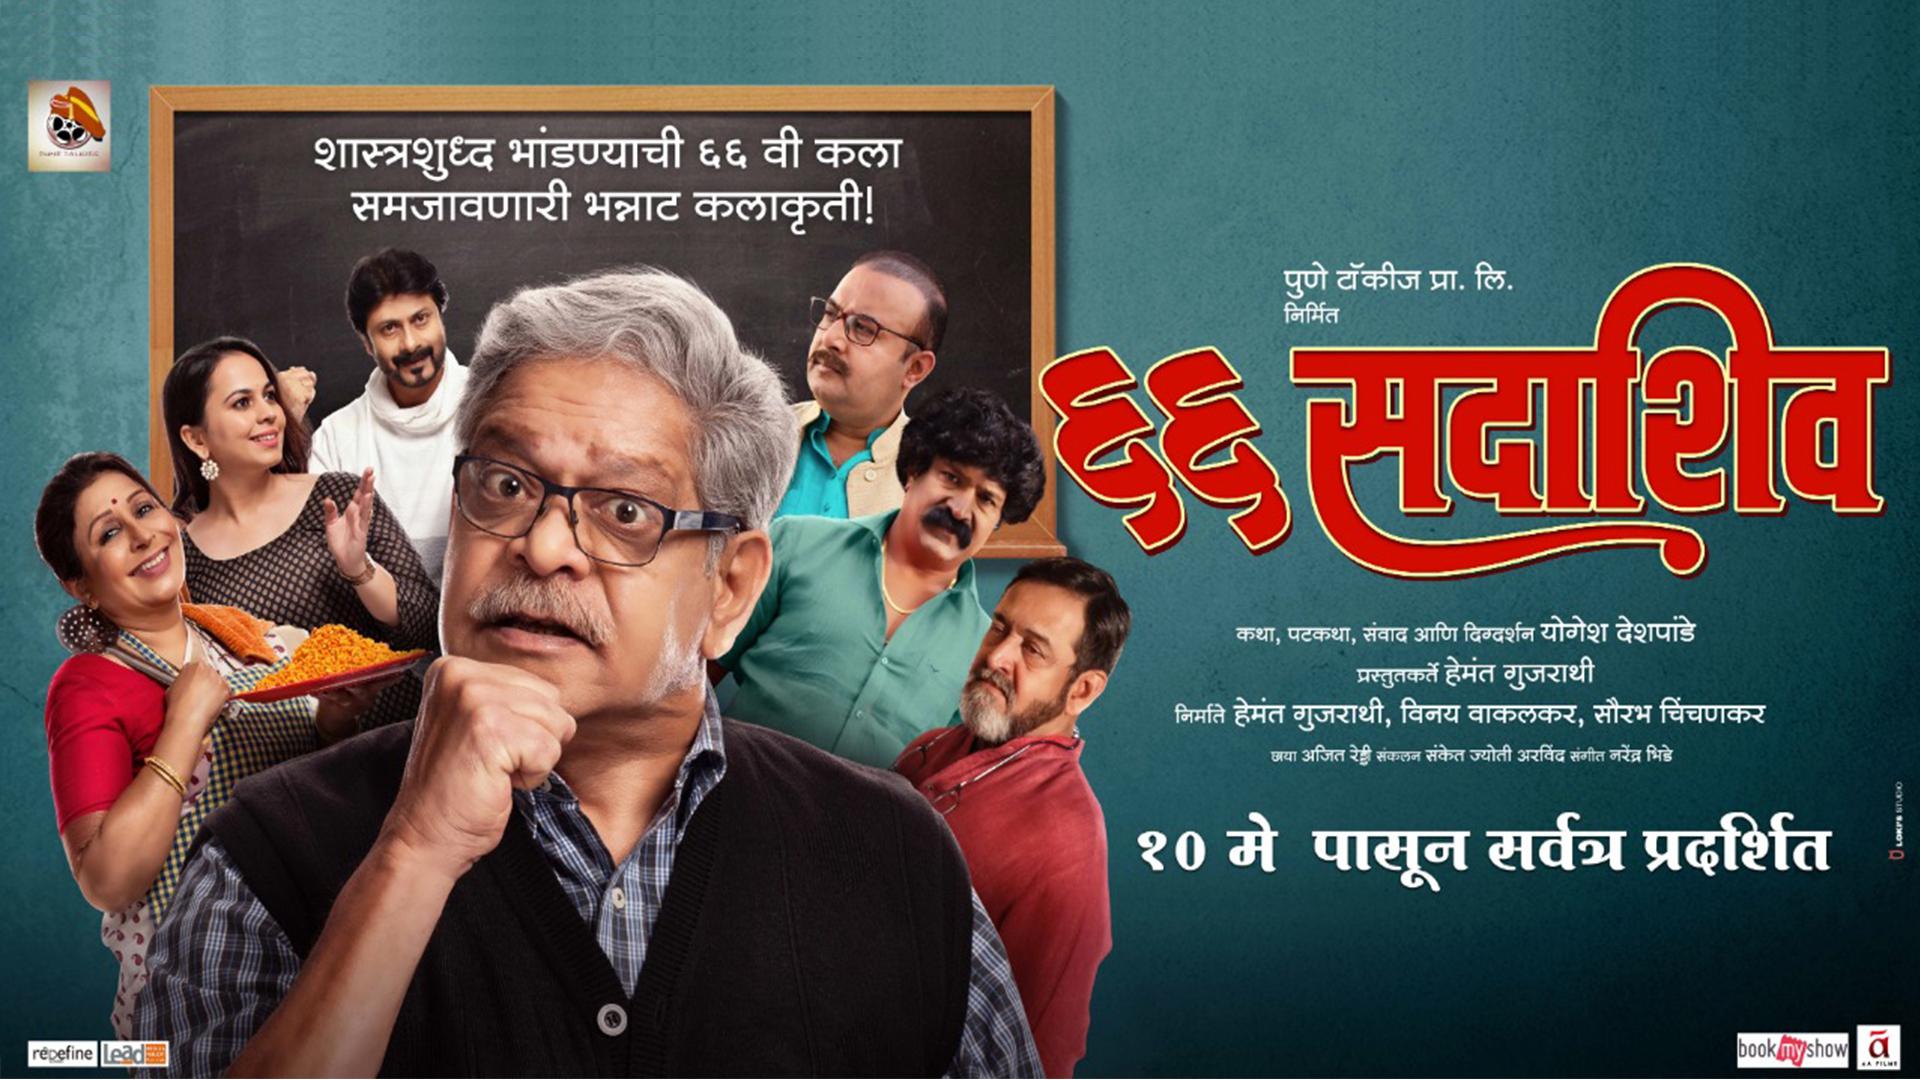 66 Sadashiv - Marathi Movie